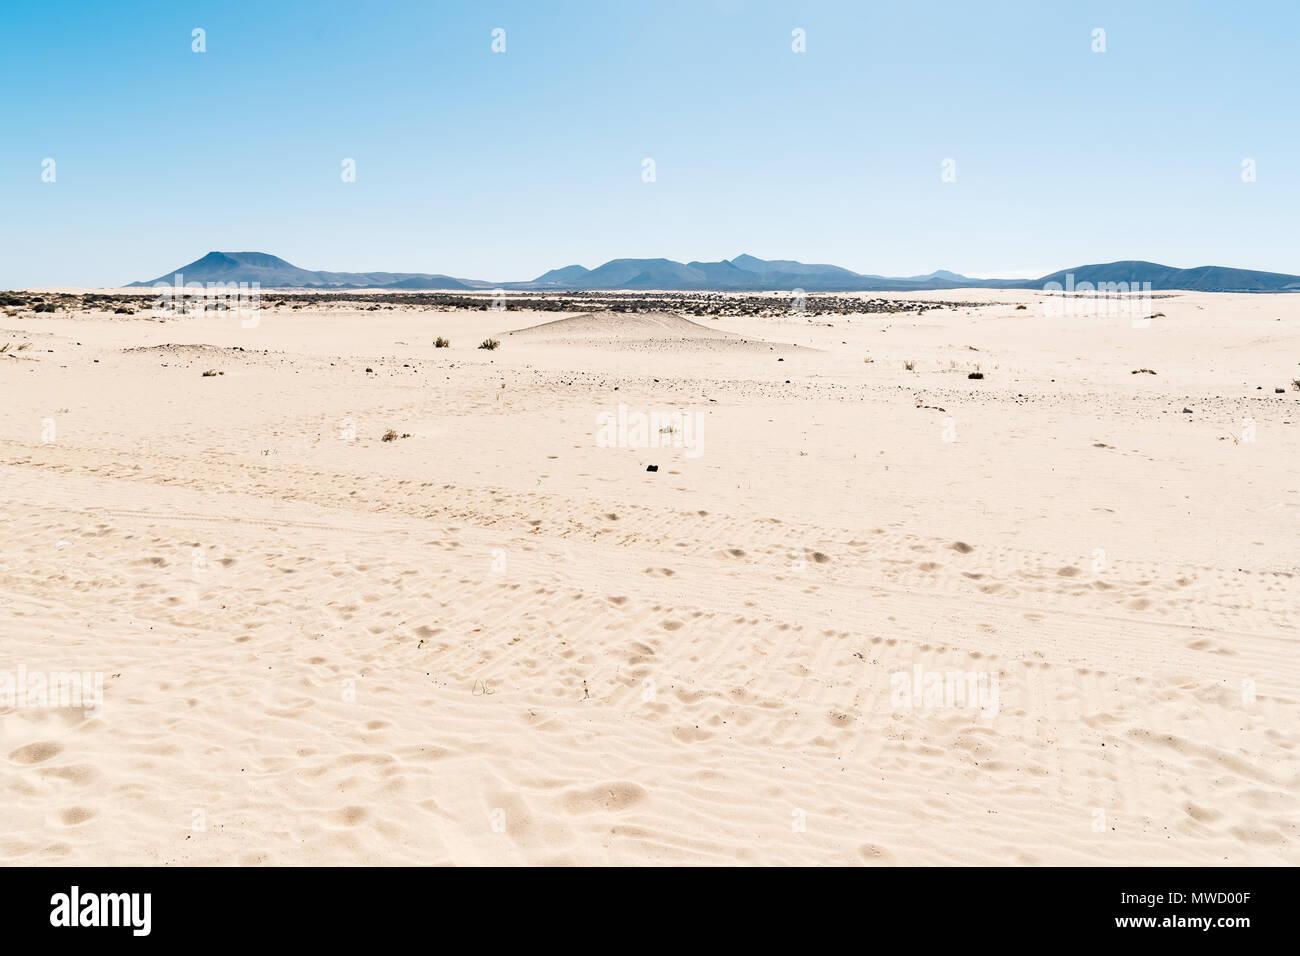 Scenic view of desert landscape. Dunes of Corralejo - Stock Image